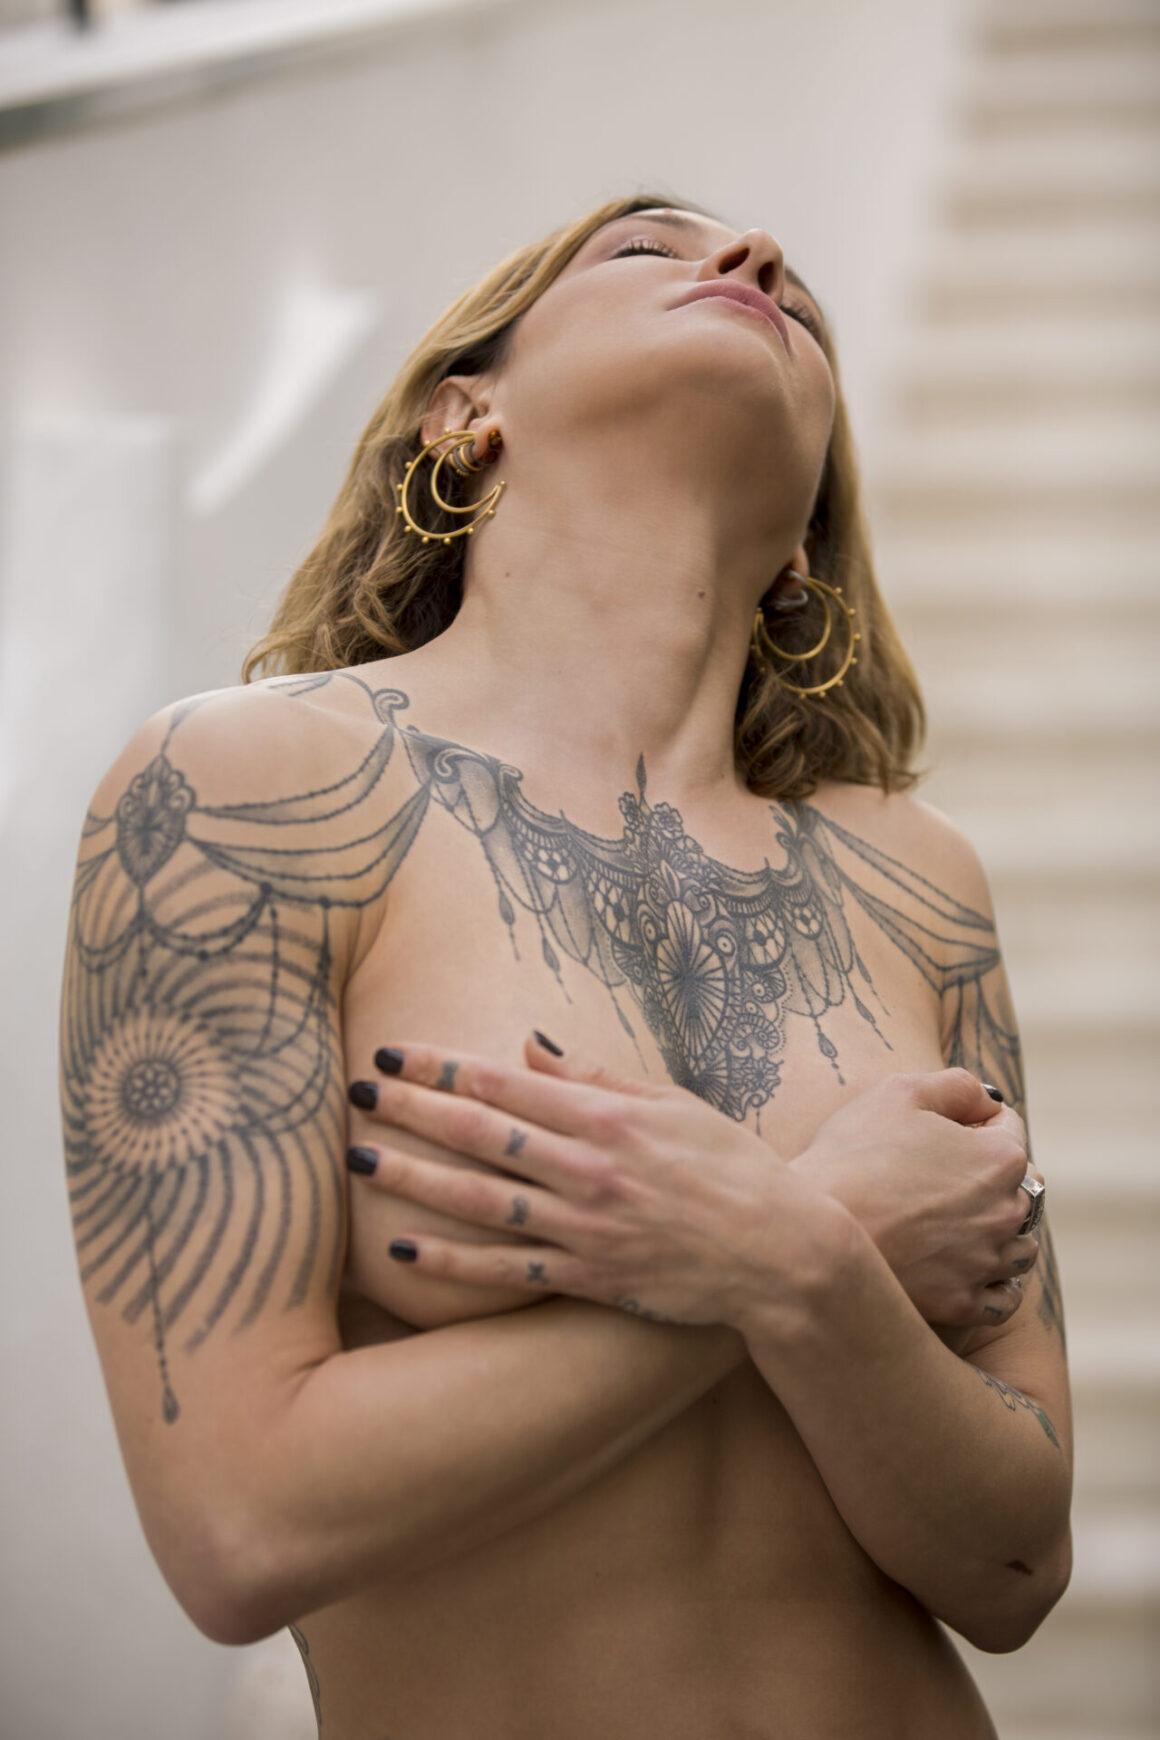 Asia Argento, credits by Pietro Piacenti